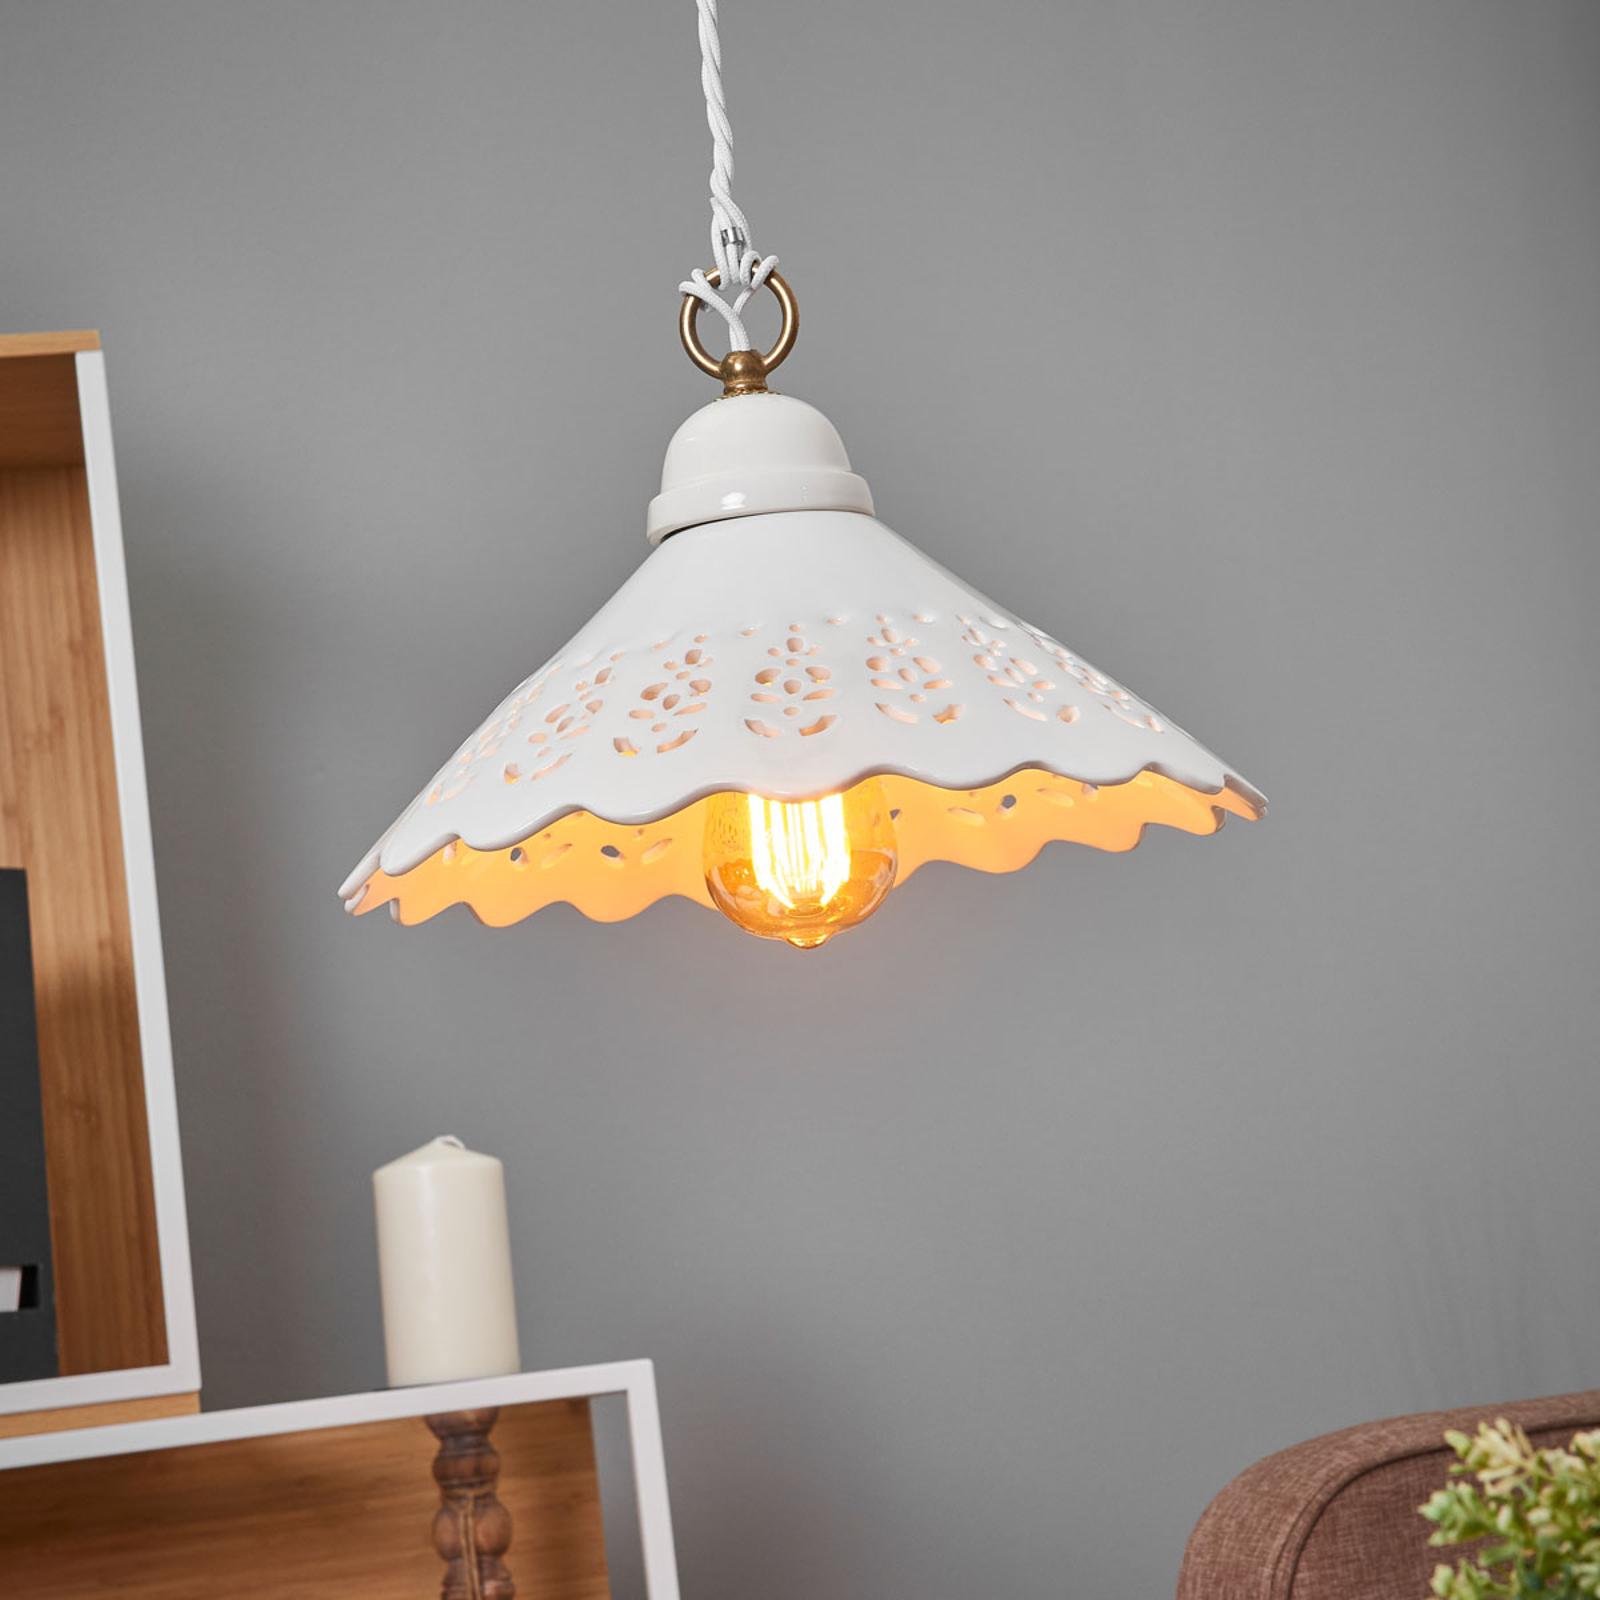 Závesná lampa Pizzo, 1-pl, z keramiky_2013017_1